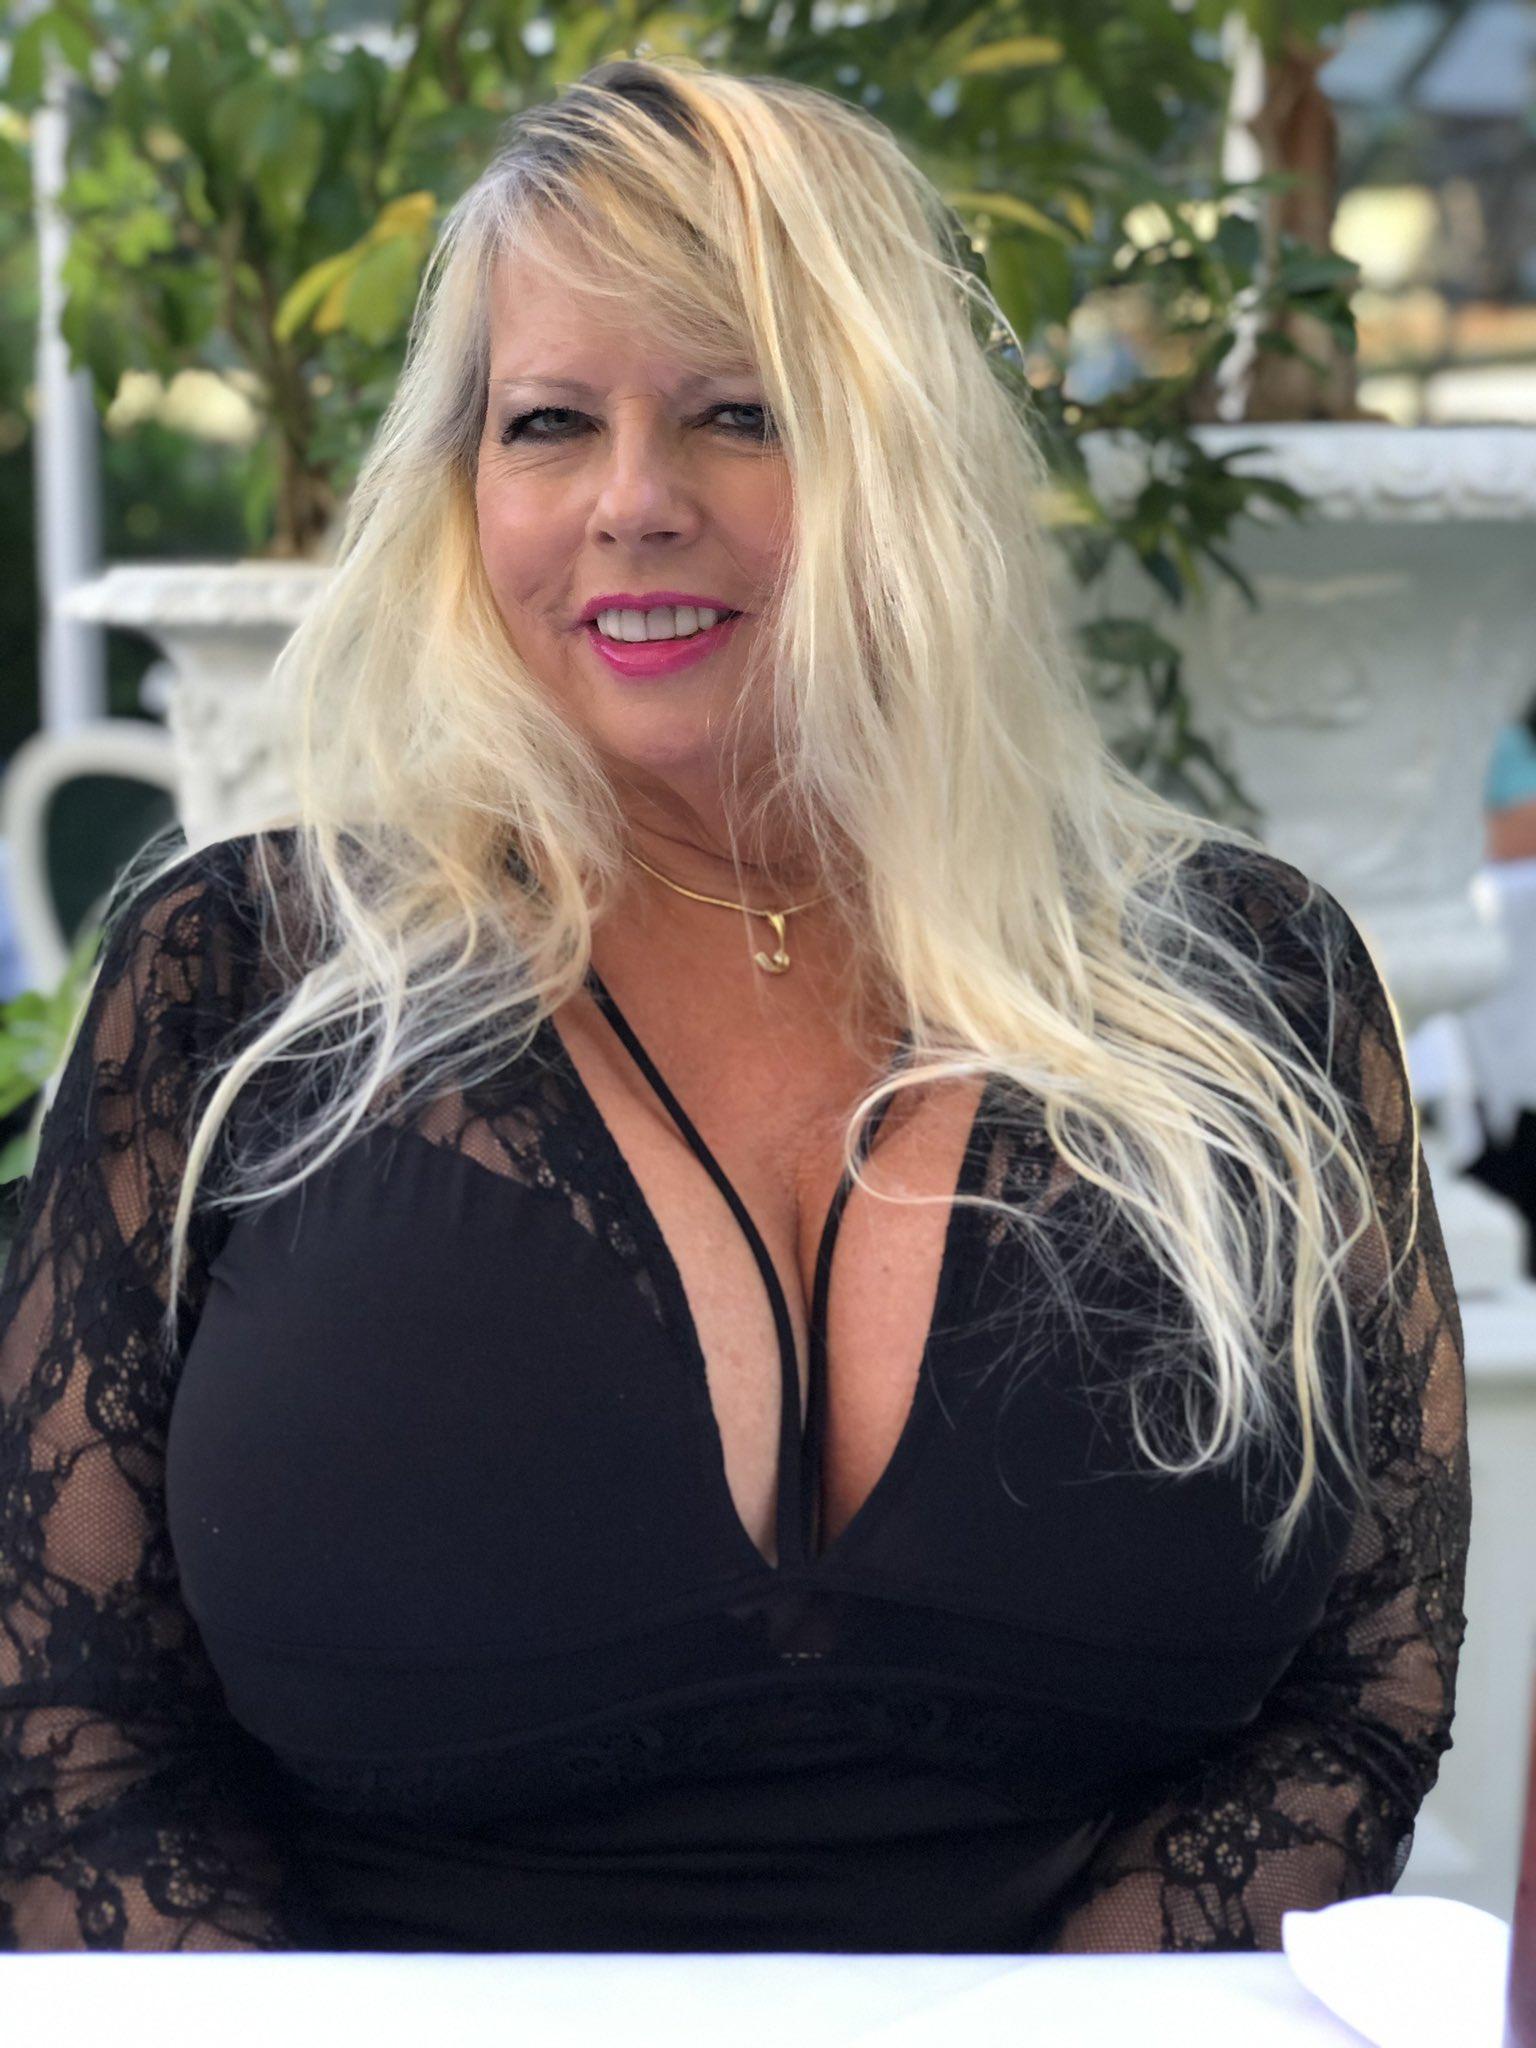 TW Pornstars - 2 pic. Kimberly Kupps. Twitter. Finally